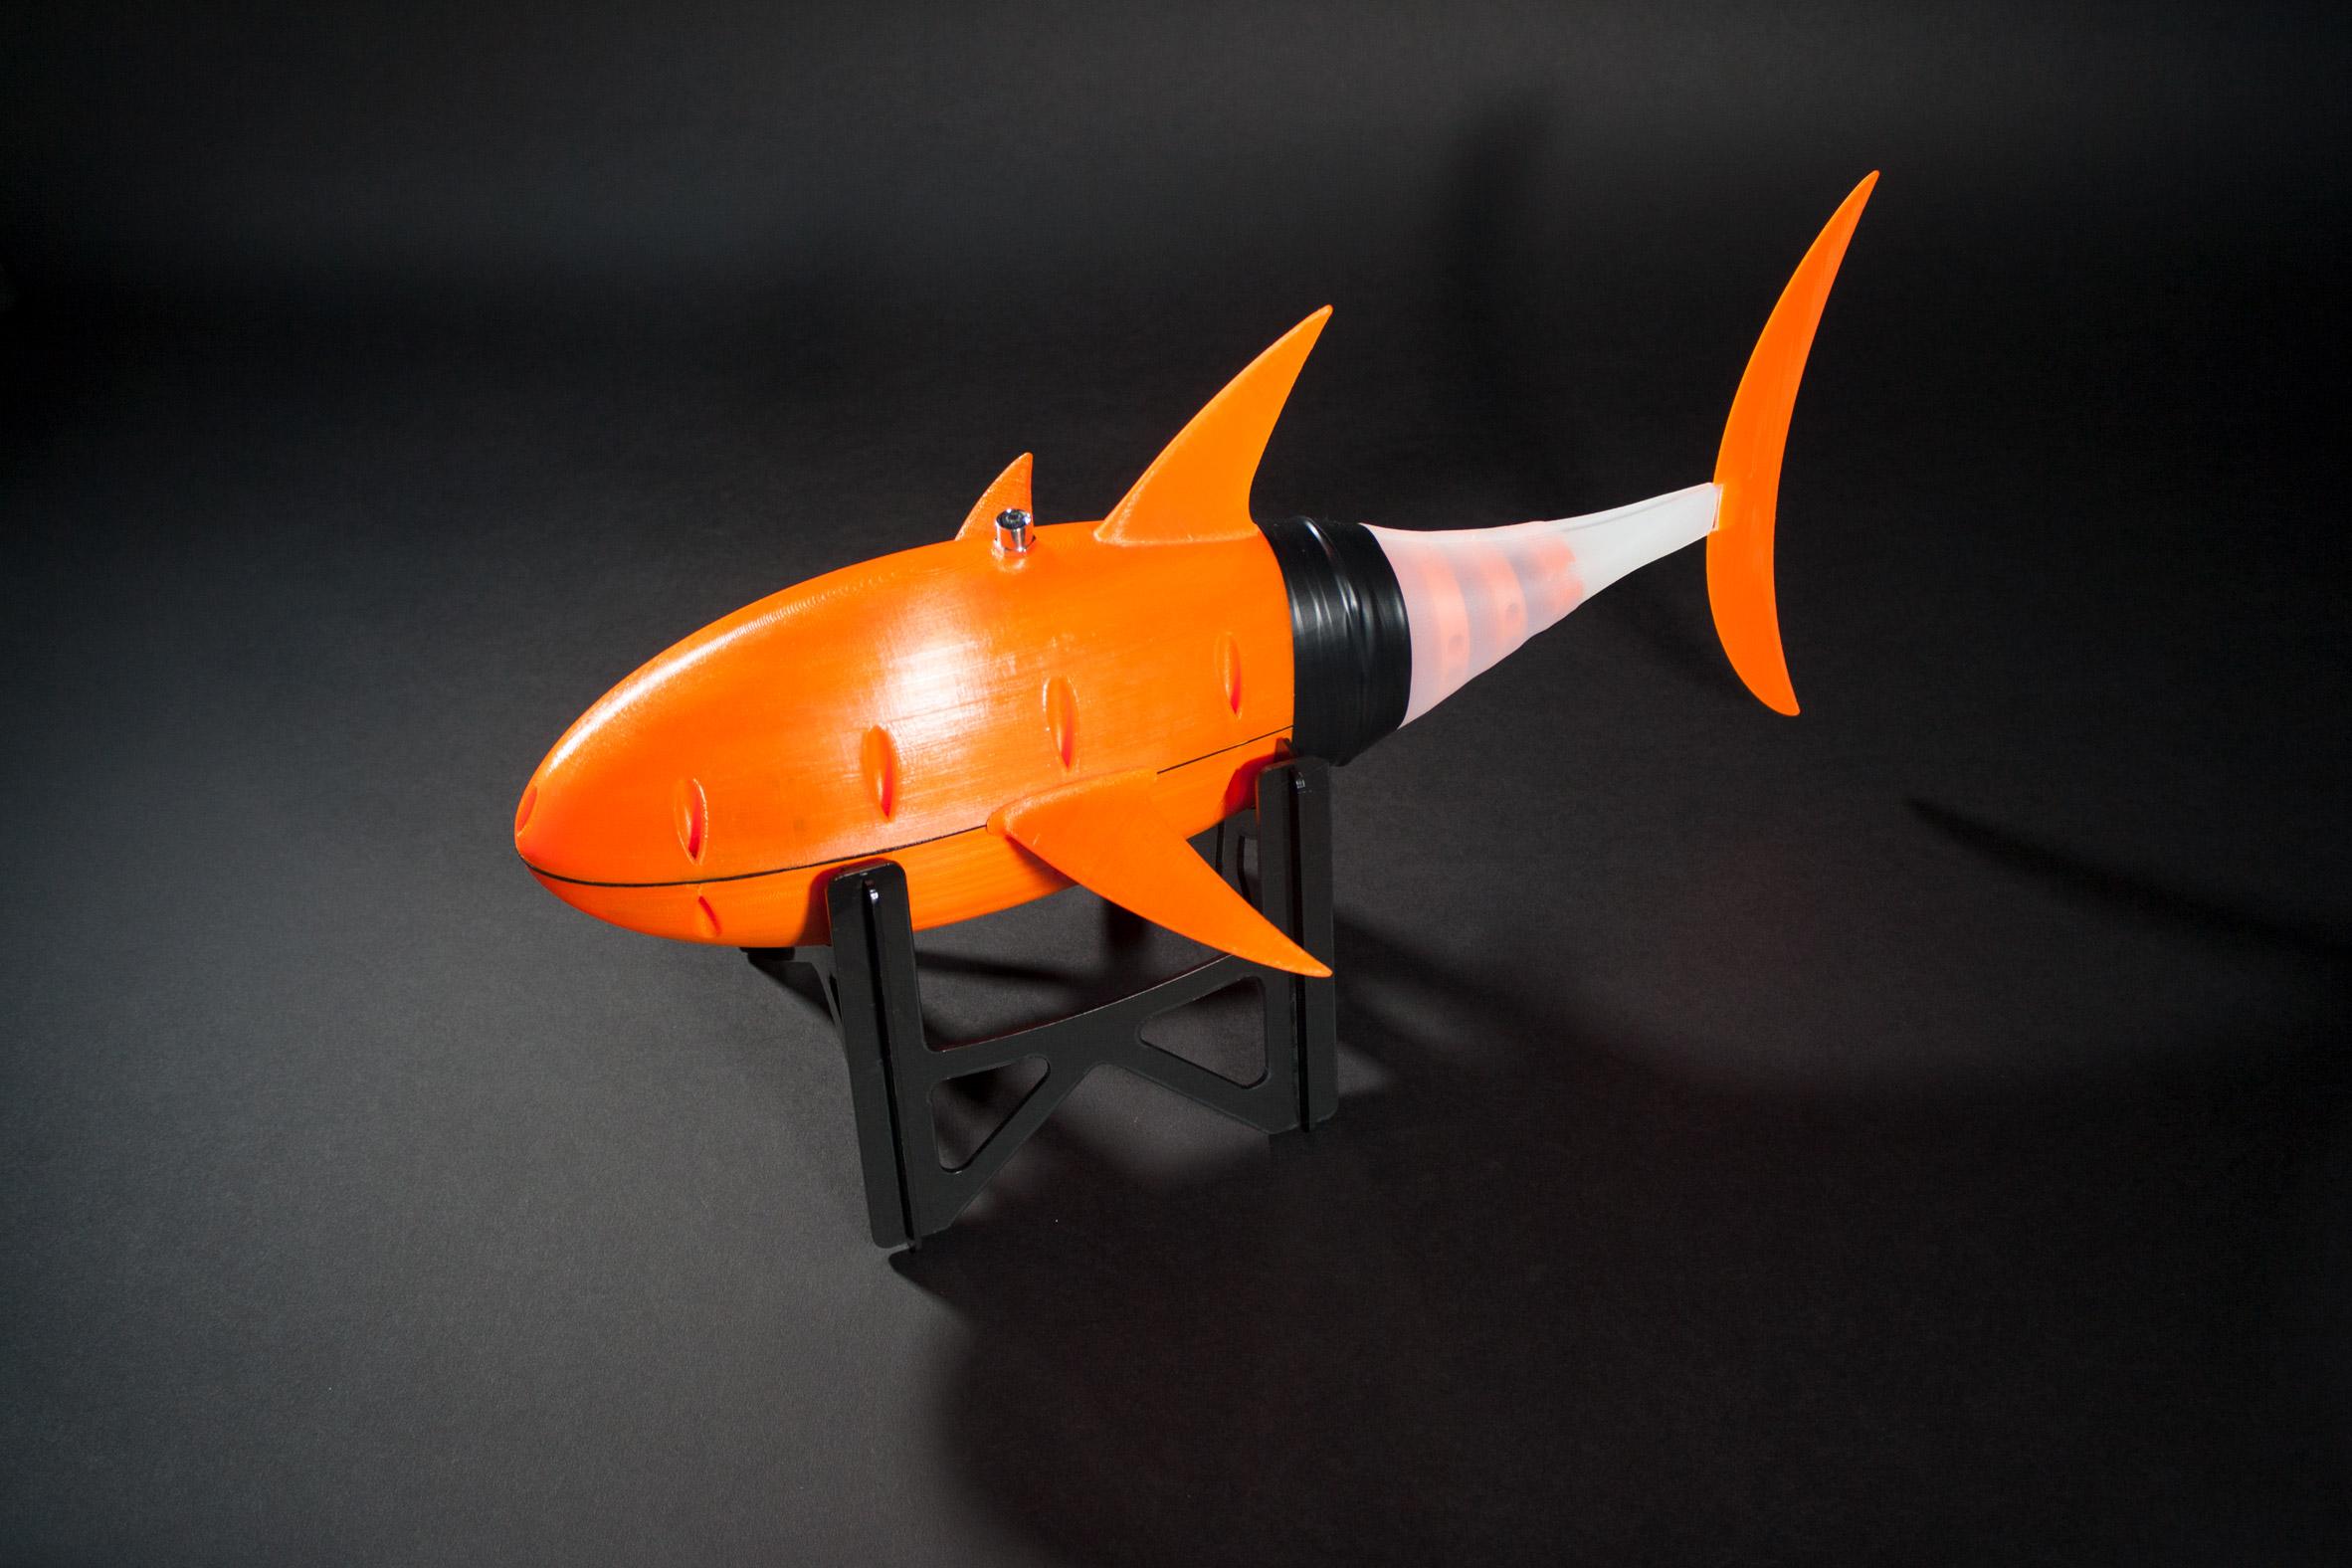 The 3D printed robotic fish. Photo via Sander van den Berg.